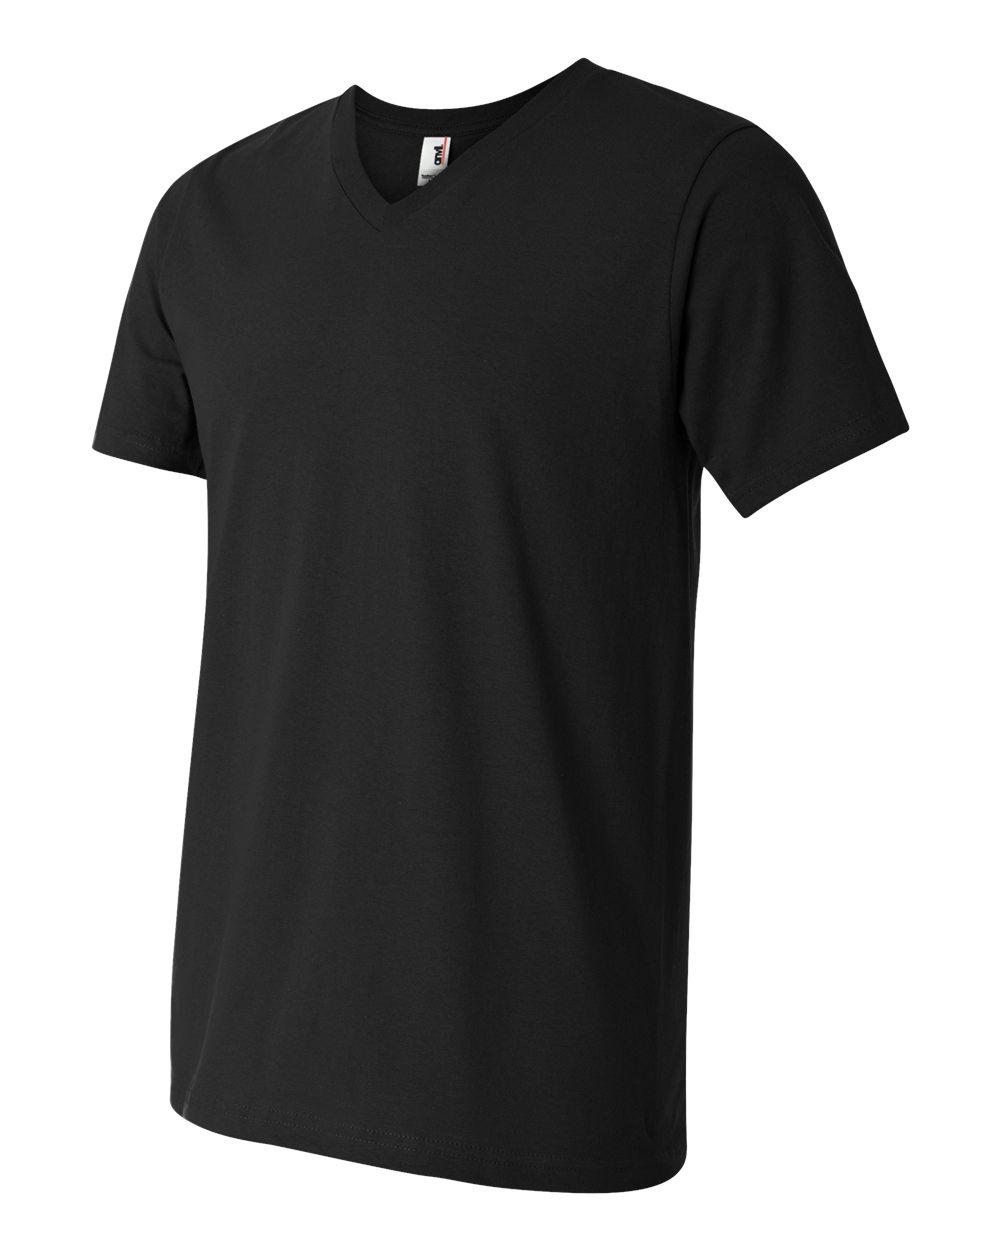 Anvil-Men-039-s-Lightweight-V-Neck-T-Shirt-982-S-3XL thumbnail 27